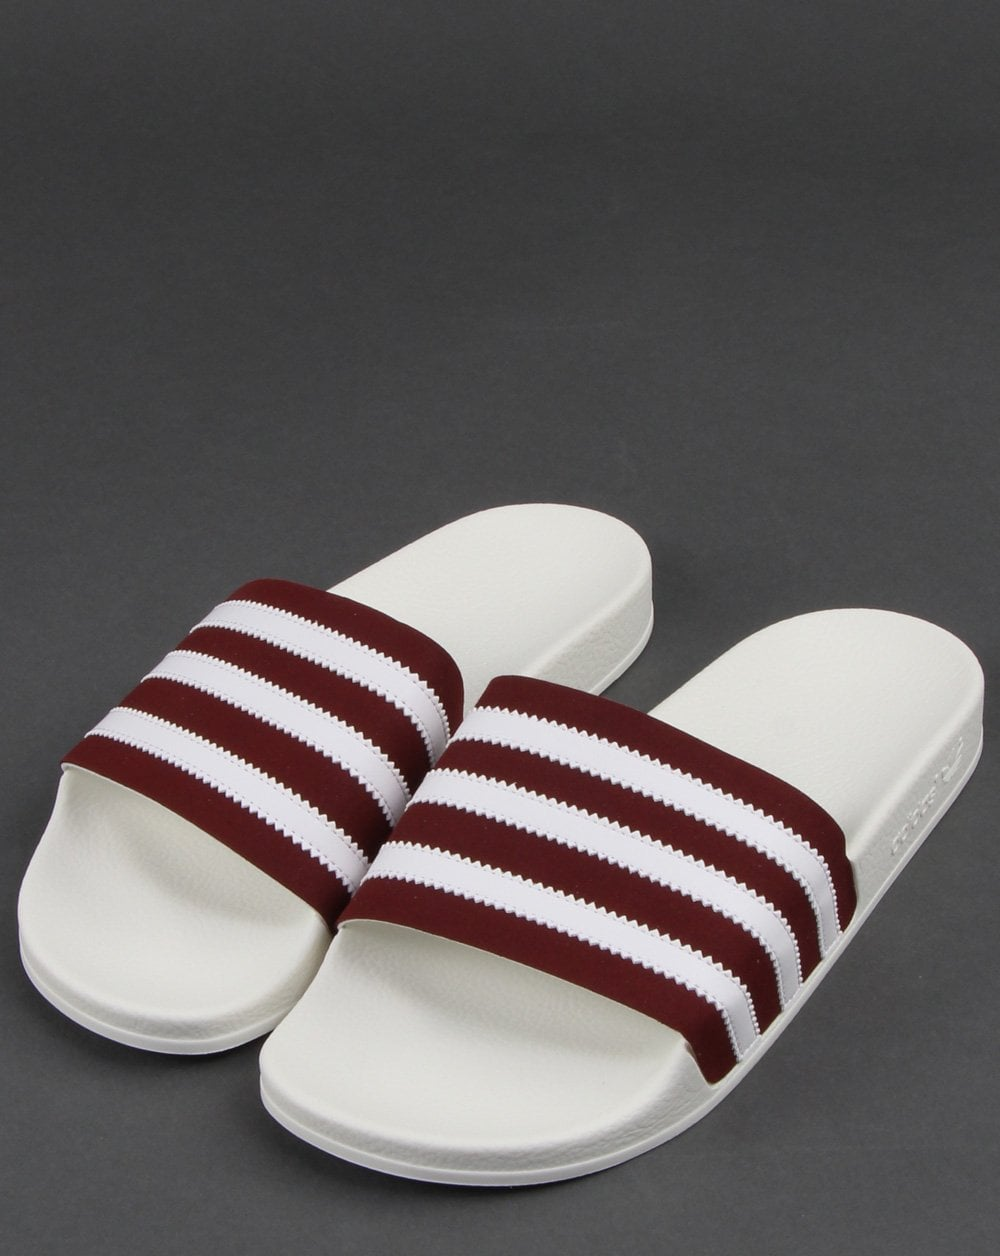 8ddbb3ae9e7 Adidas Adilette Slides Burgundy/White | 80s casual classics